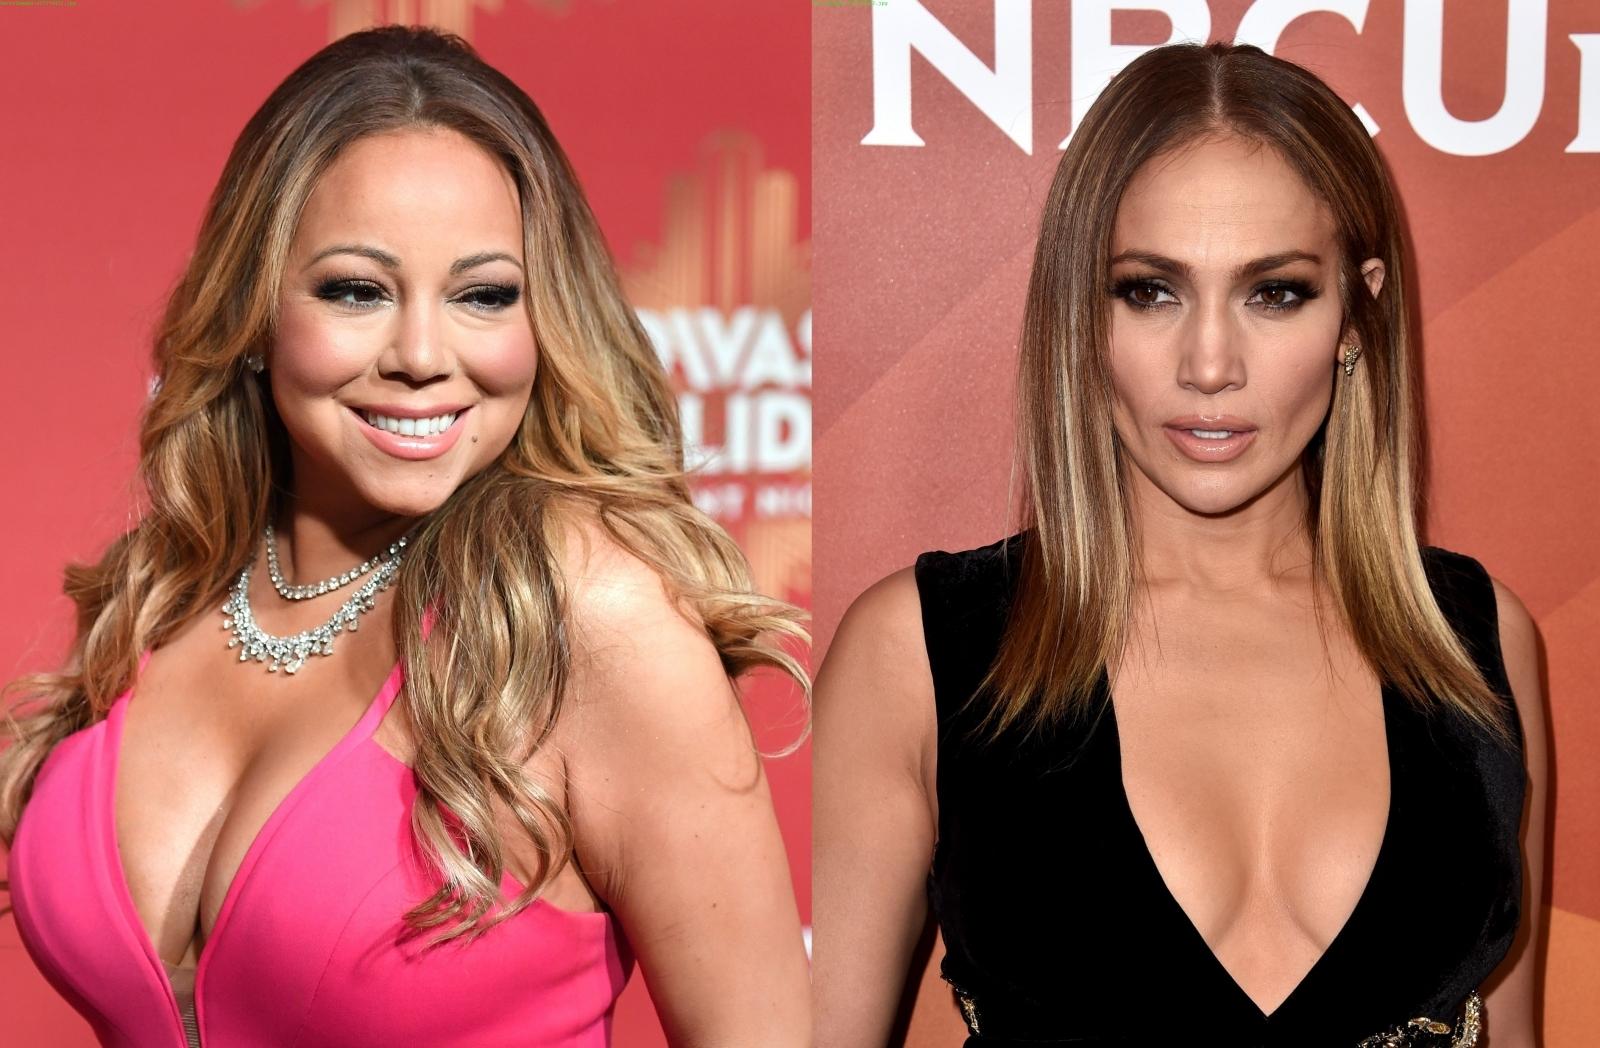 Mariah Carey and Jennifer Lopez